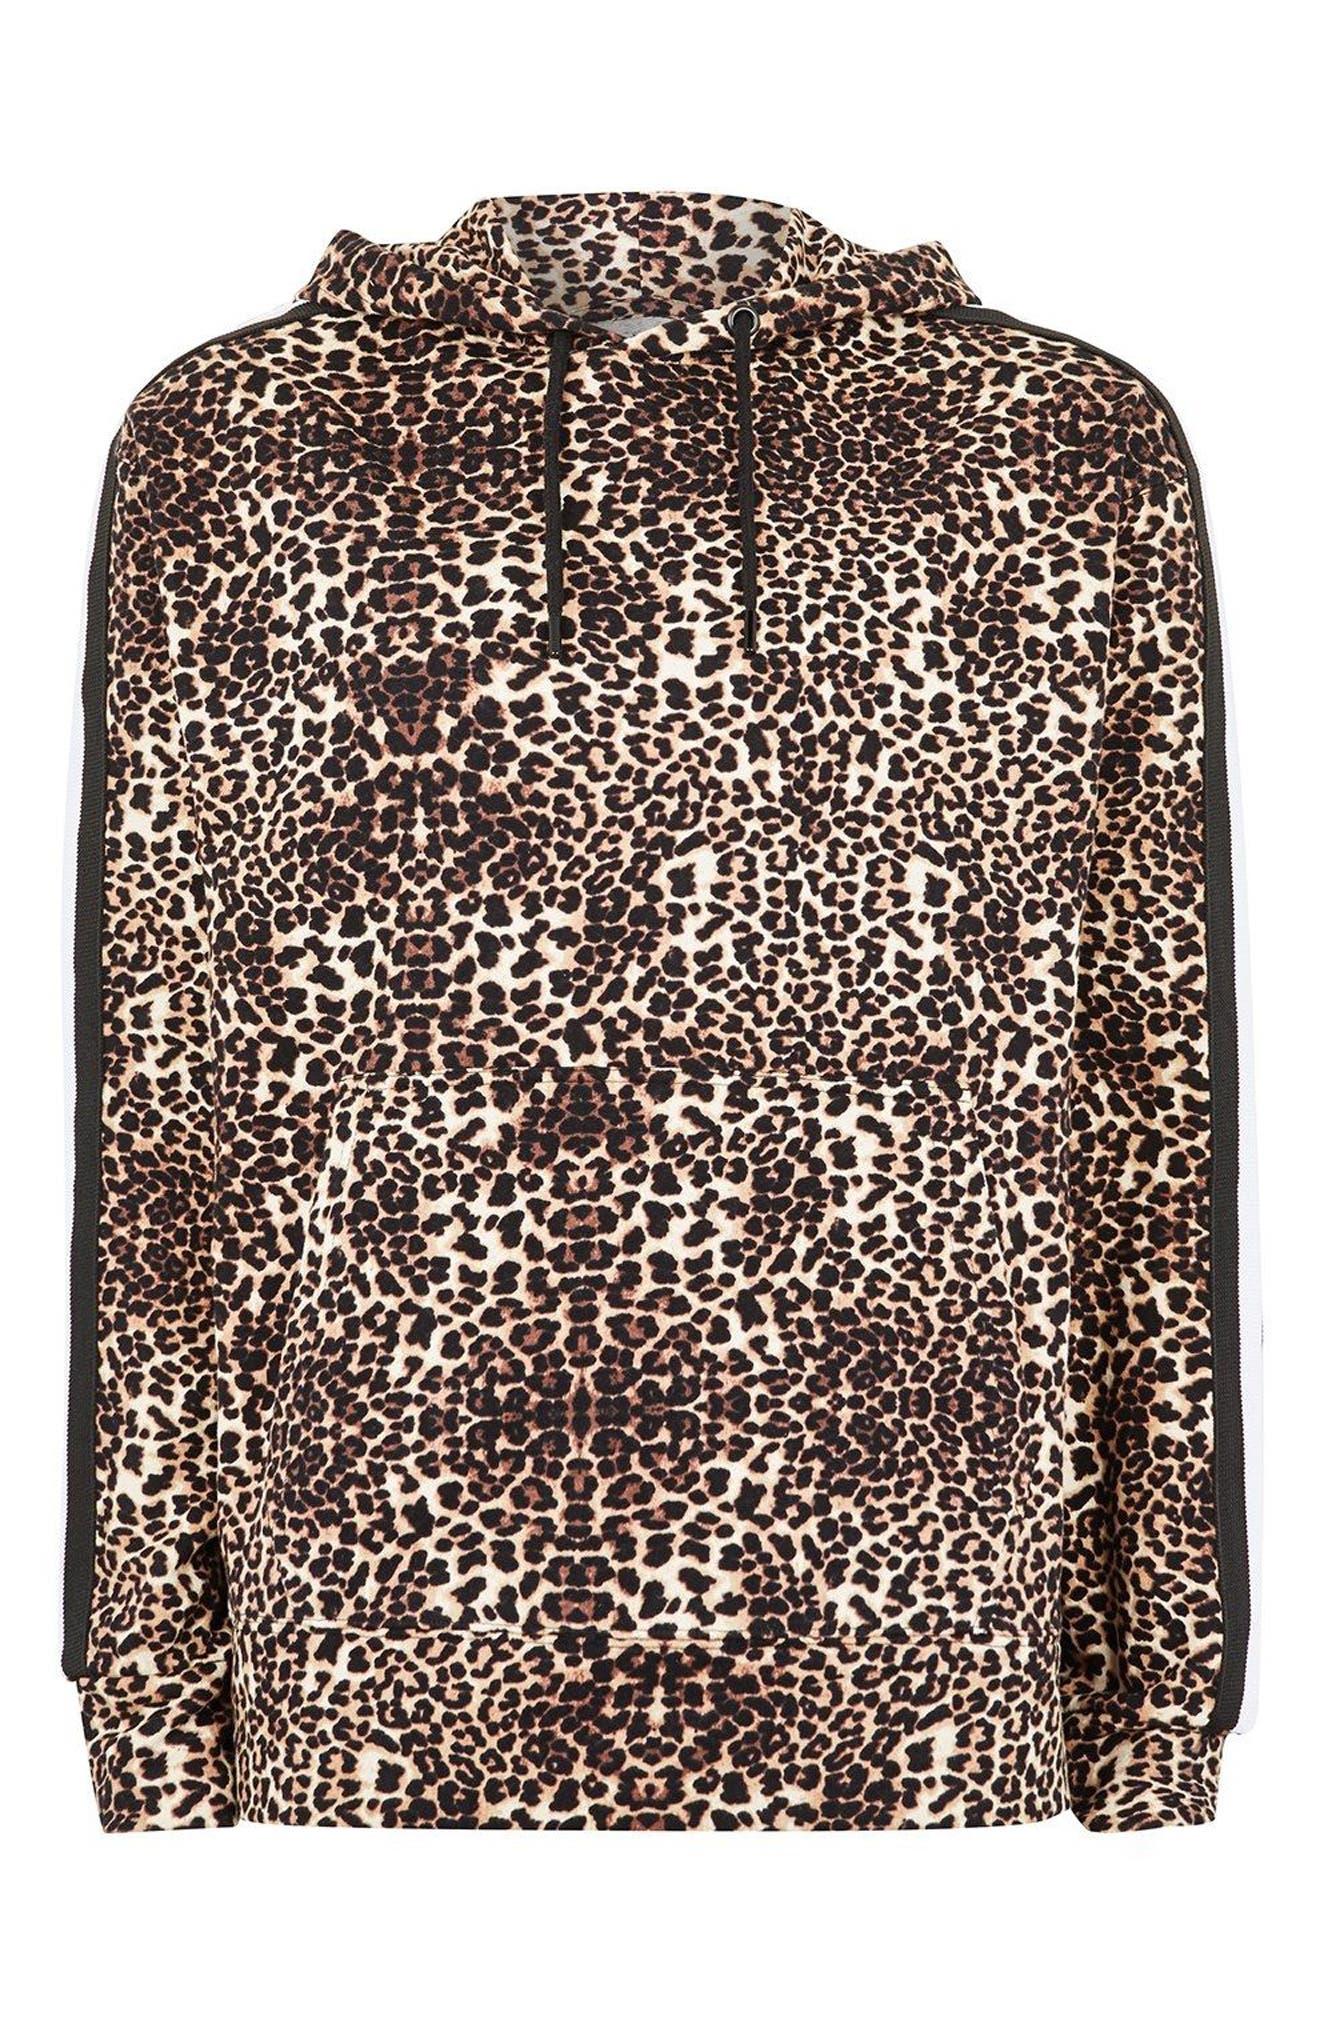 Leopard Print Hoodie,                             Main thumbnail 1, color,